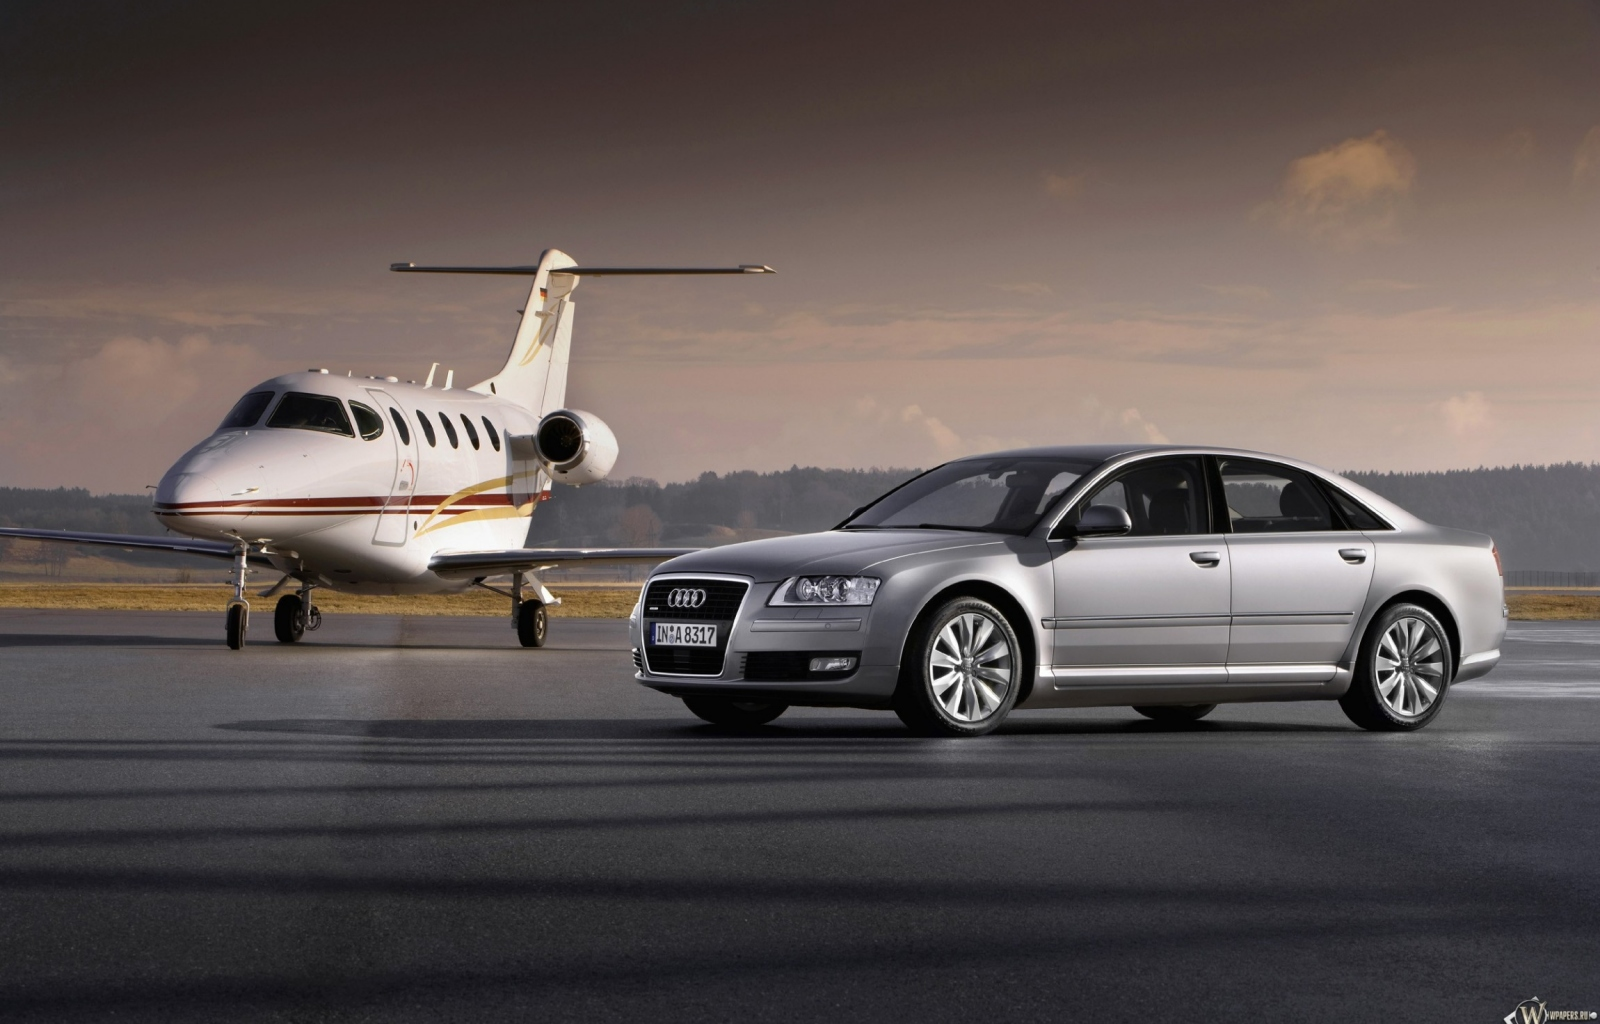 Audi A8 (2008) 1600x1024